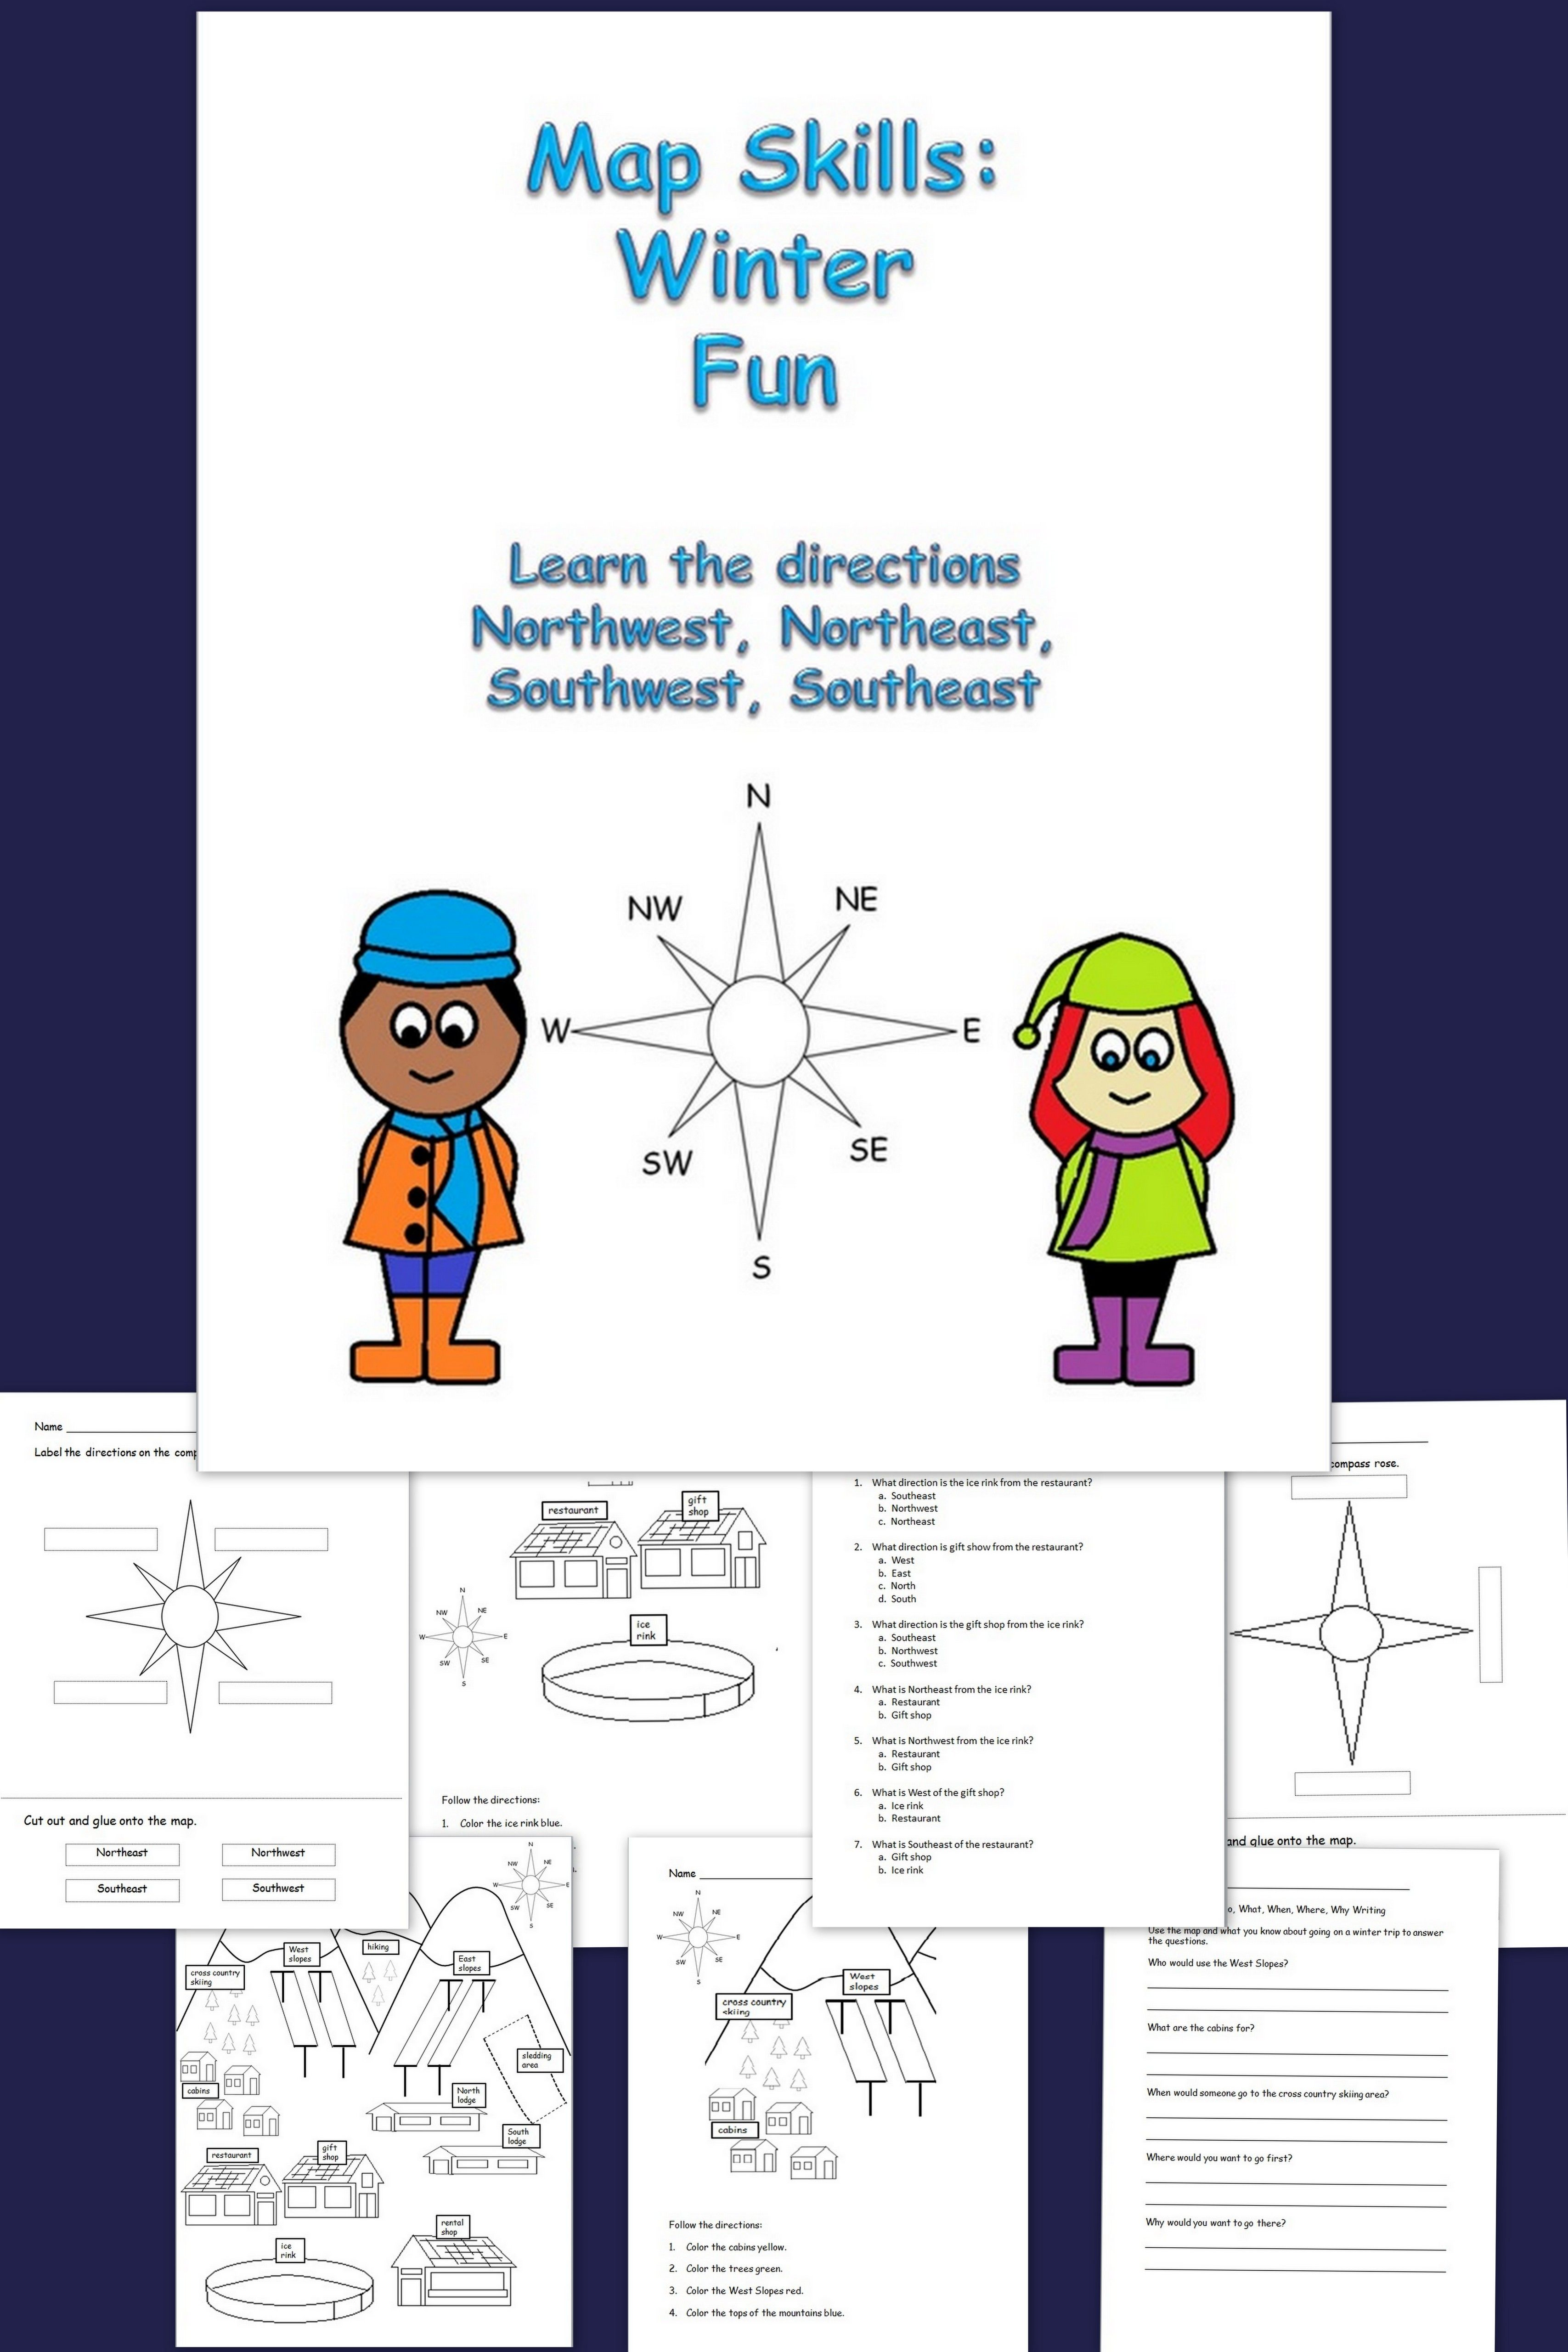 Map Skills Winter Fun